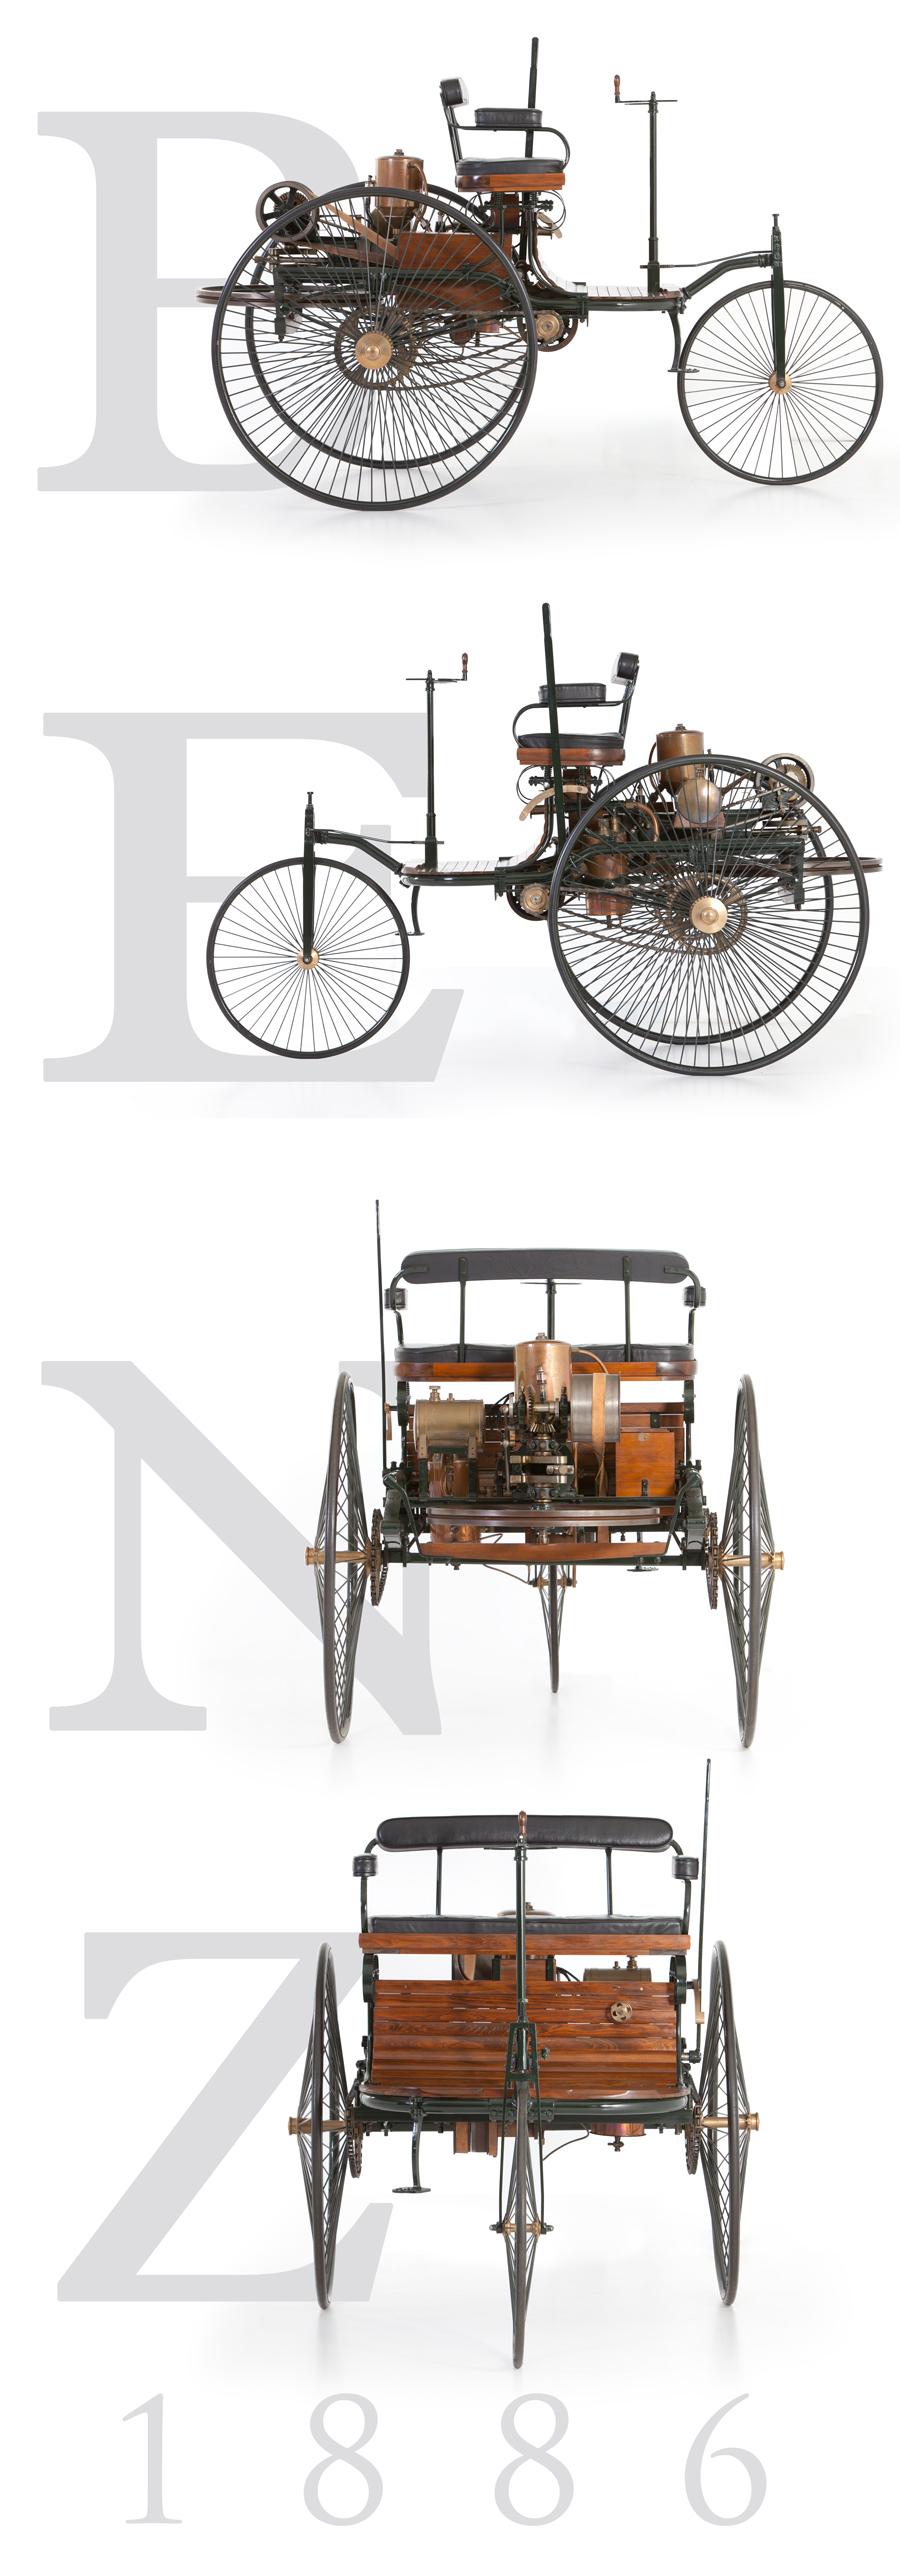 Benz-1886